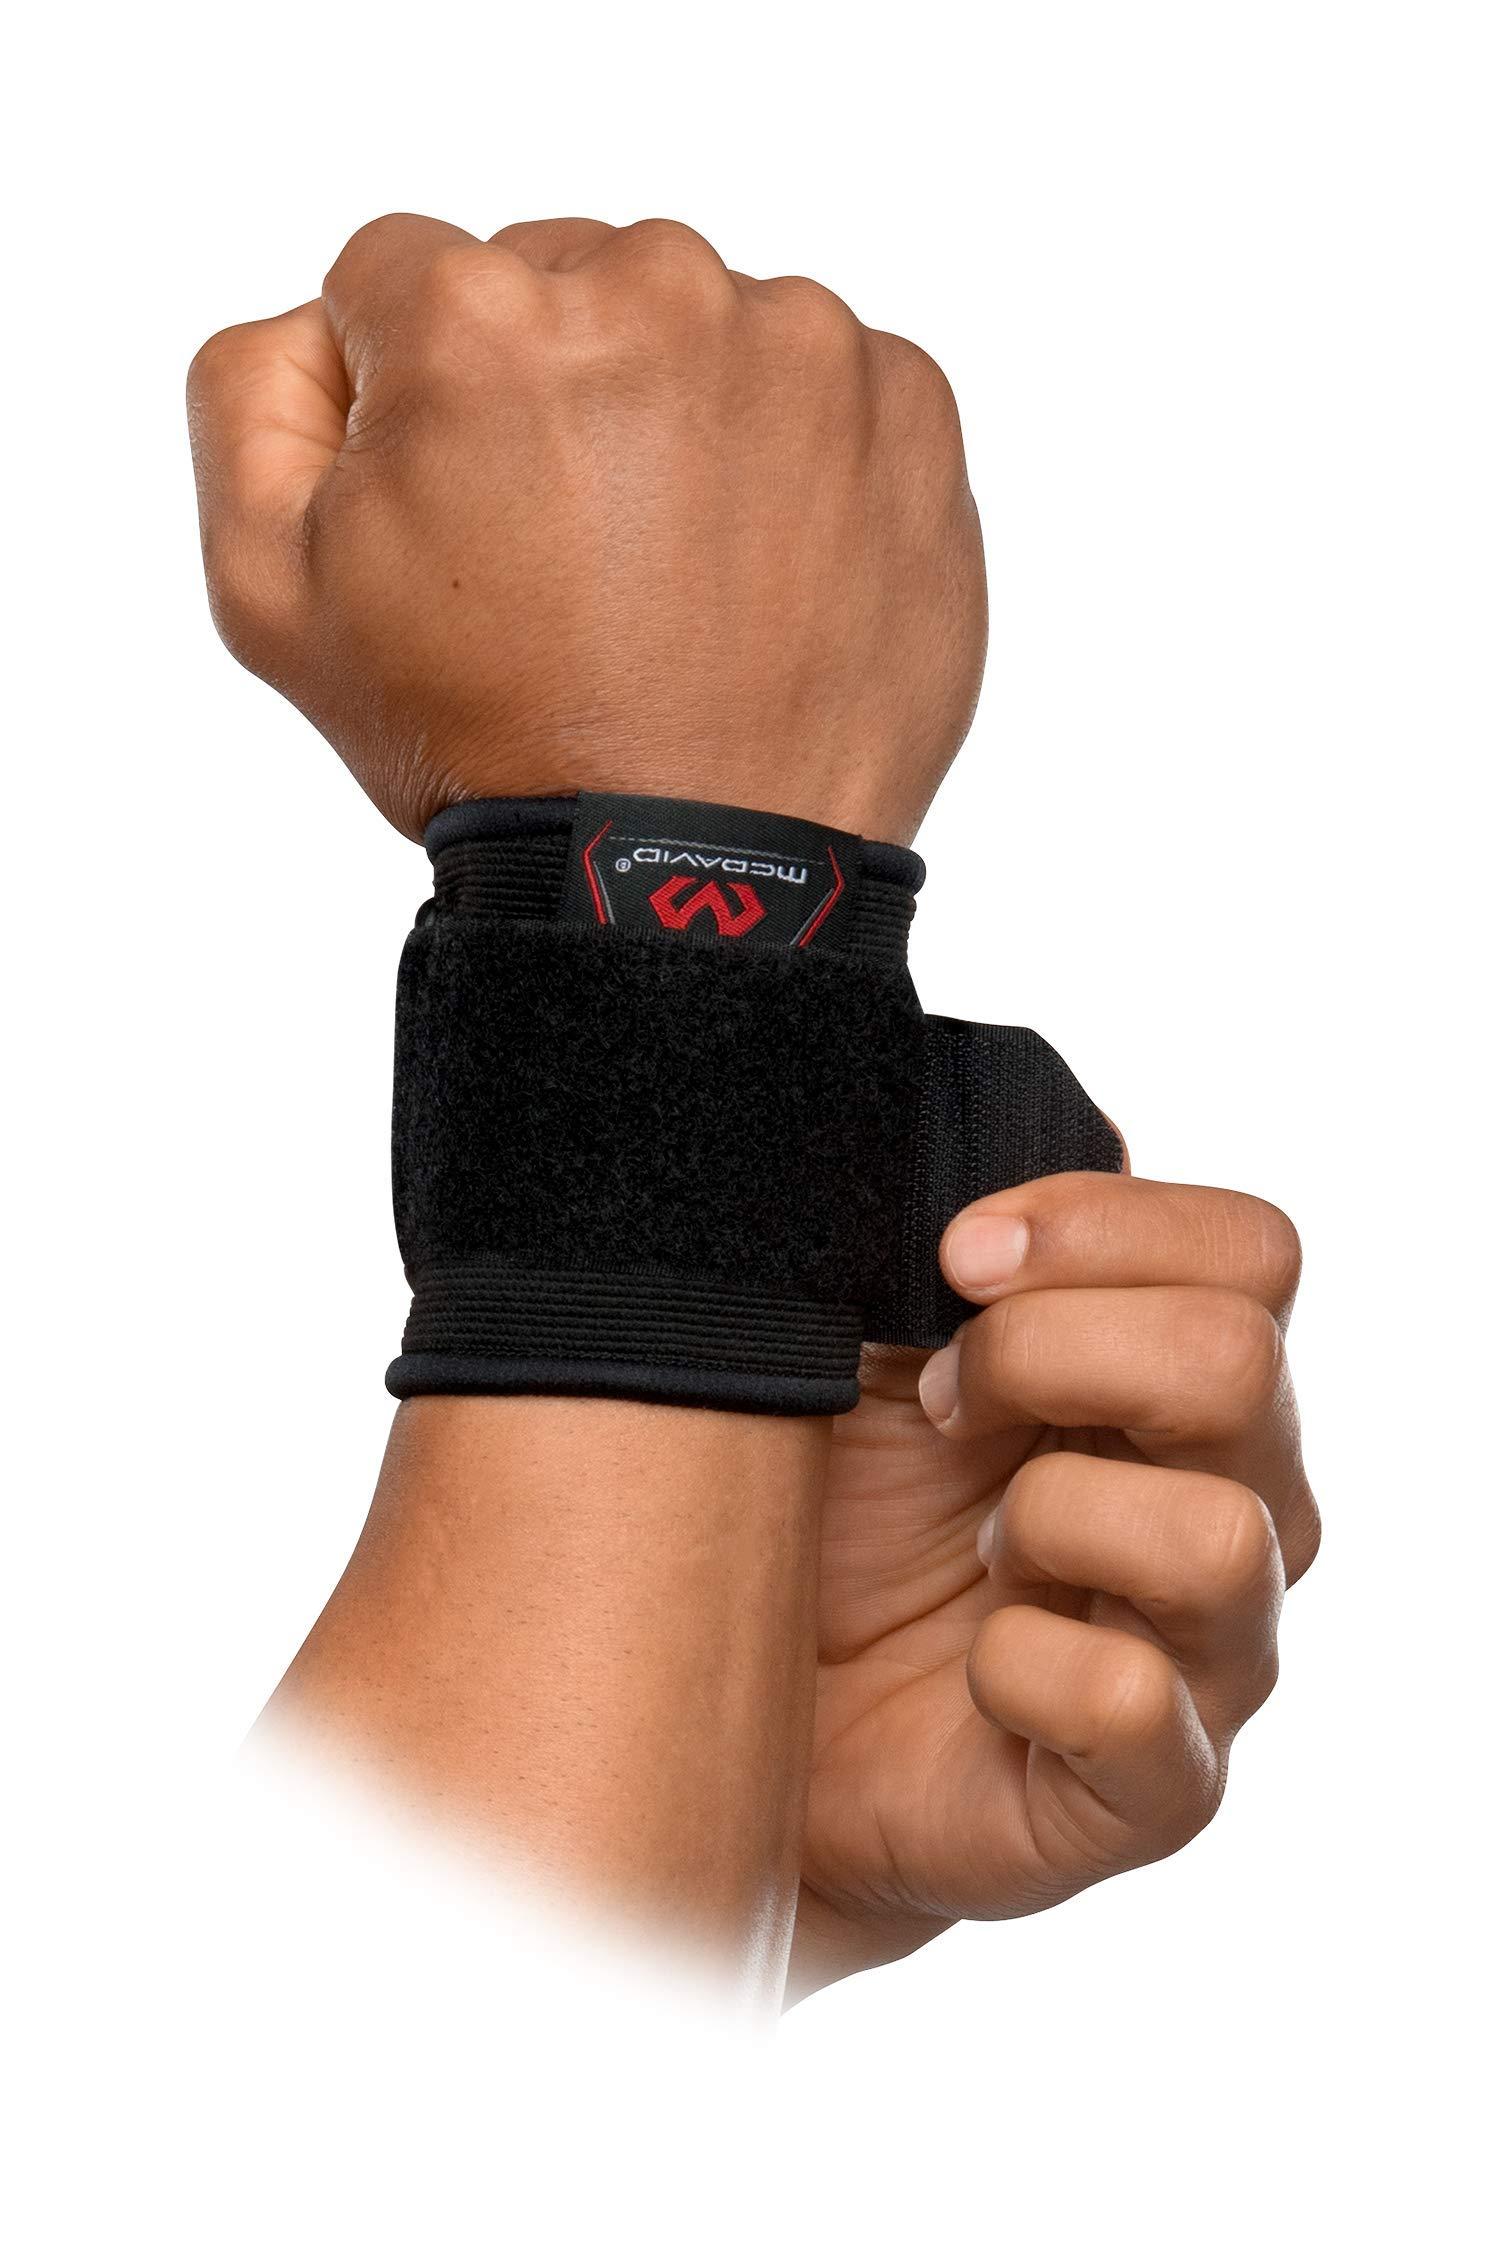 McDavid 513 Elastic Wrist Support, Large/X-Large by McDavid (Image #1)